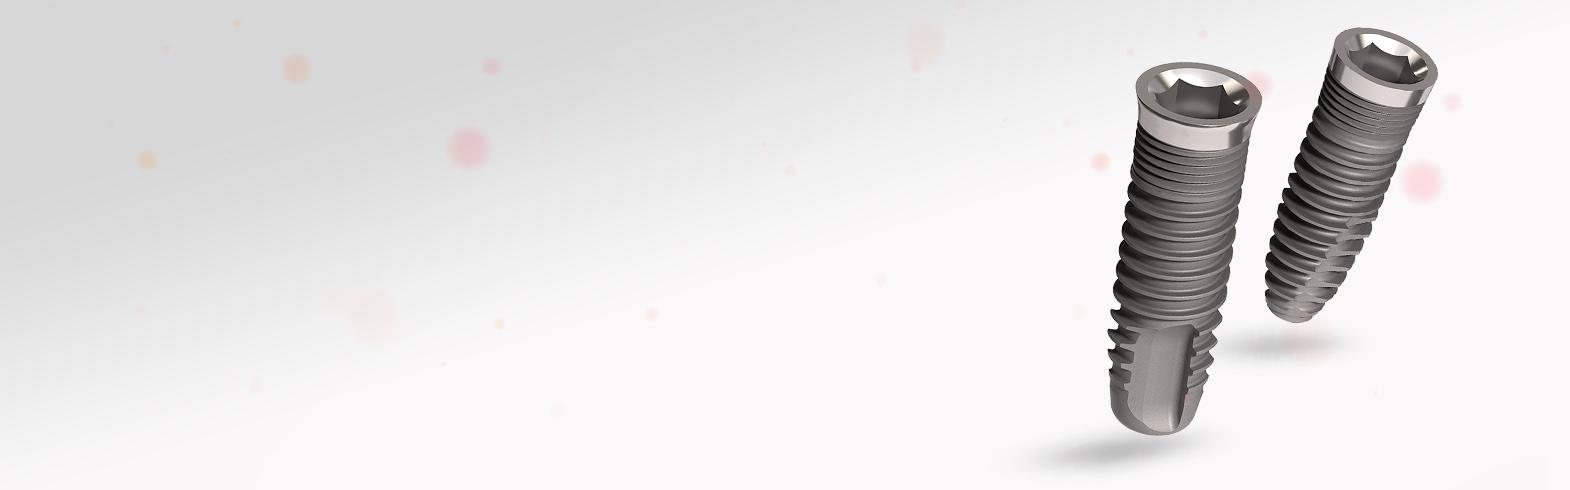 EVL®_Kit di protesi di prova EVL®